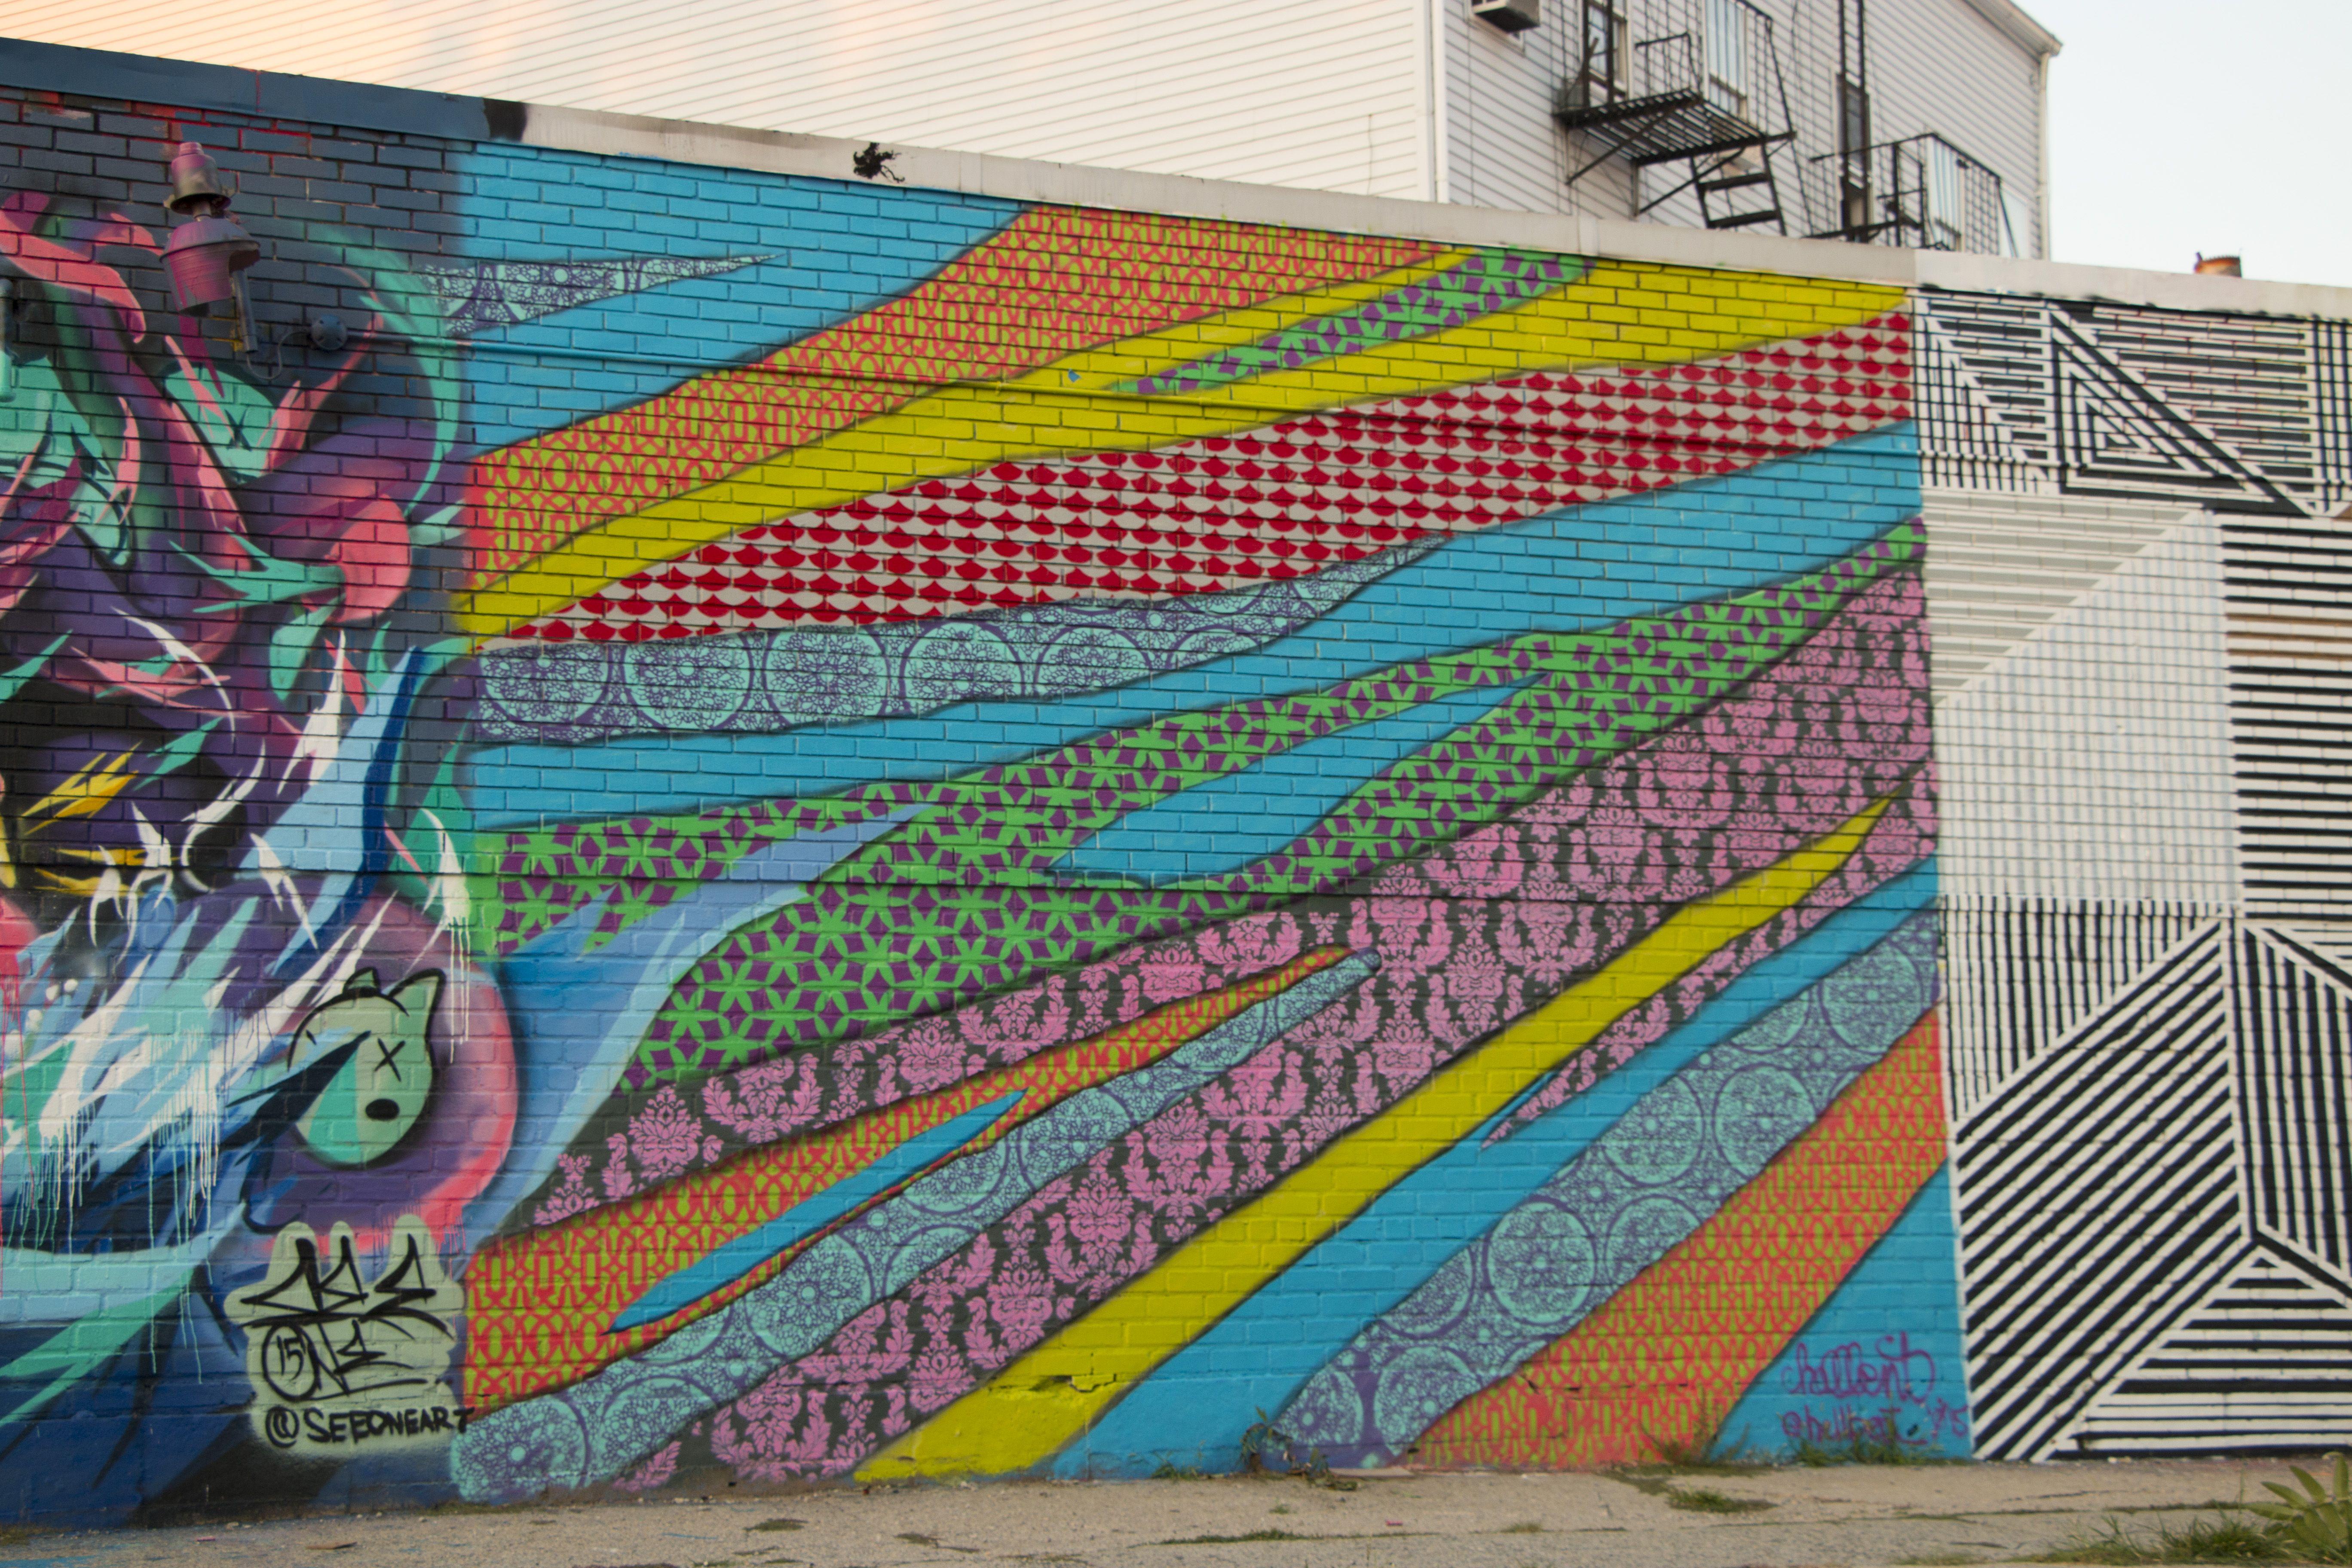 Graffiti wall in queens ny - Graffiti